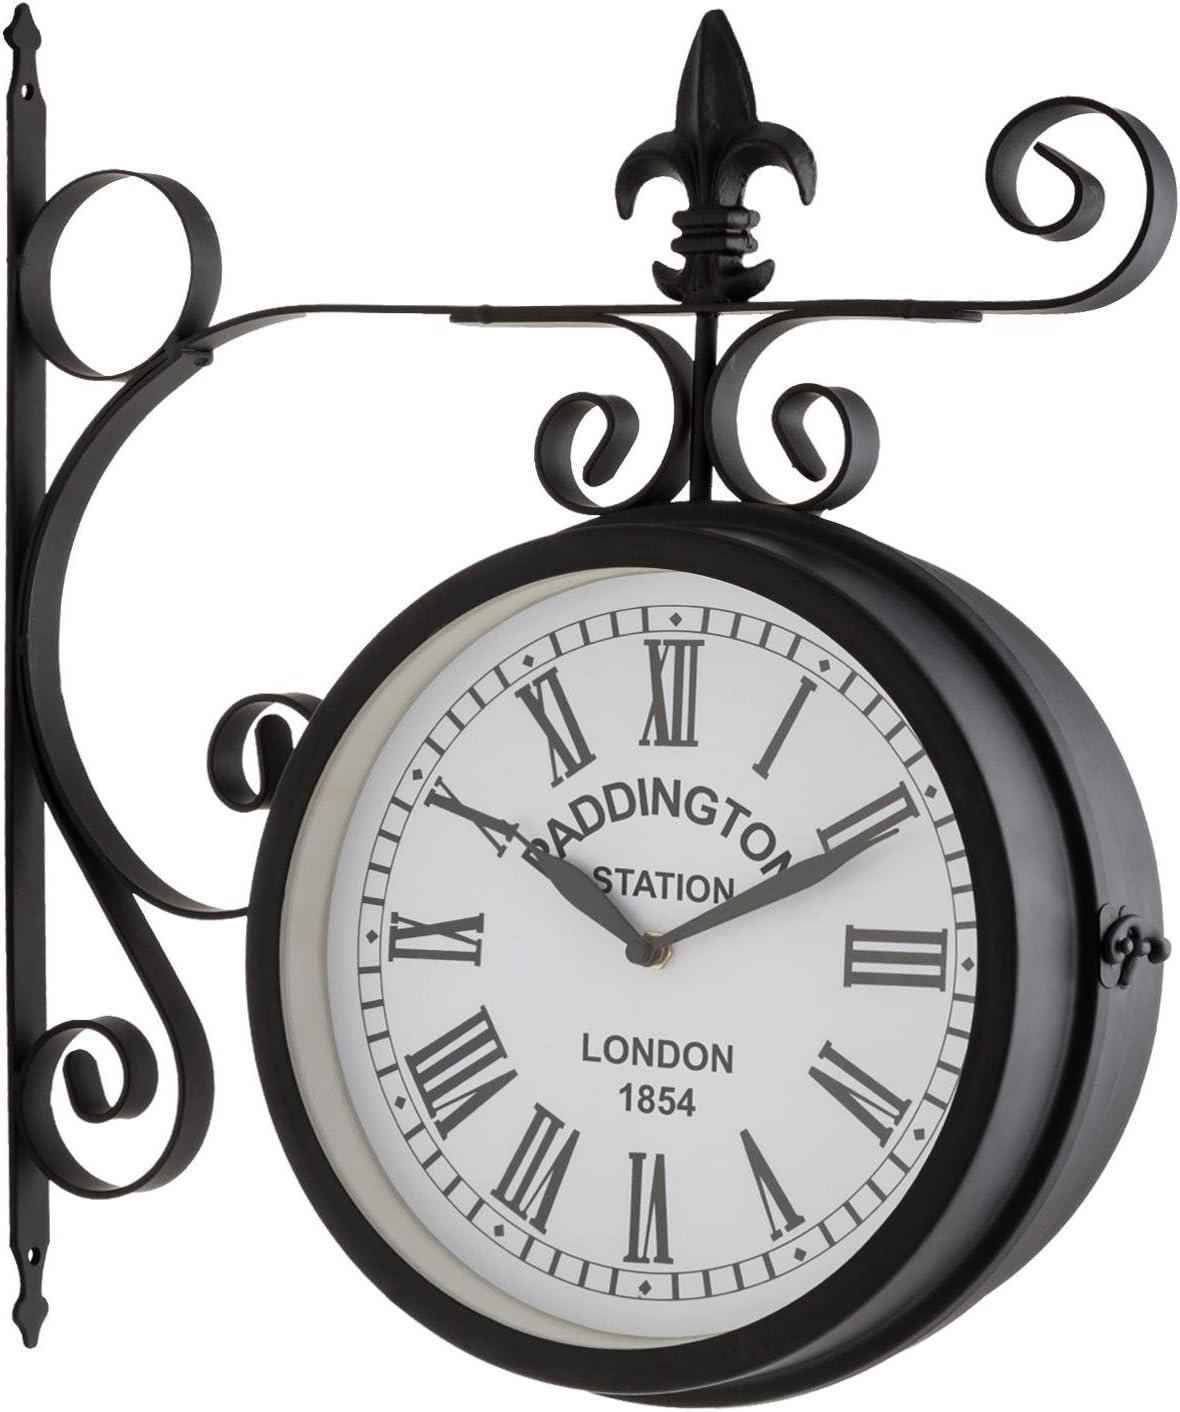 Blumfeldt Paddington Reloj de Pared (diseño Retro Siglo XIX, Esfera estanca 23 cm diámetro, 2 Caras, números Romanos Grandes, Material Resistente Exterior jardín, Carcasa metálica Negro Mate)